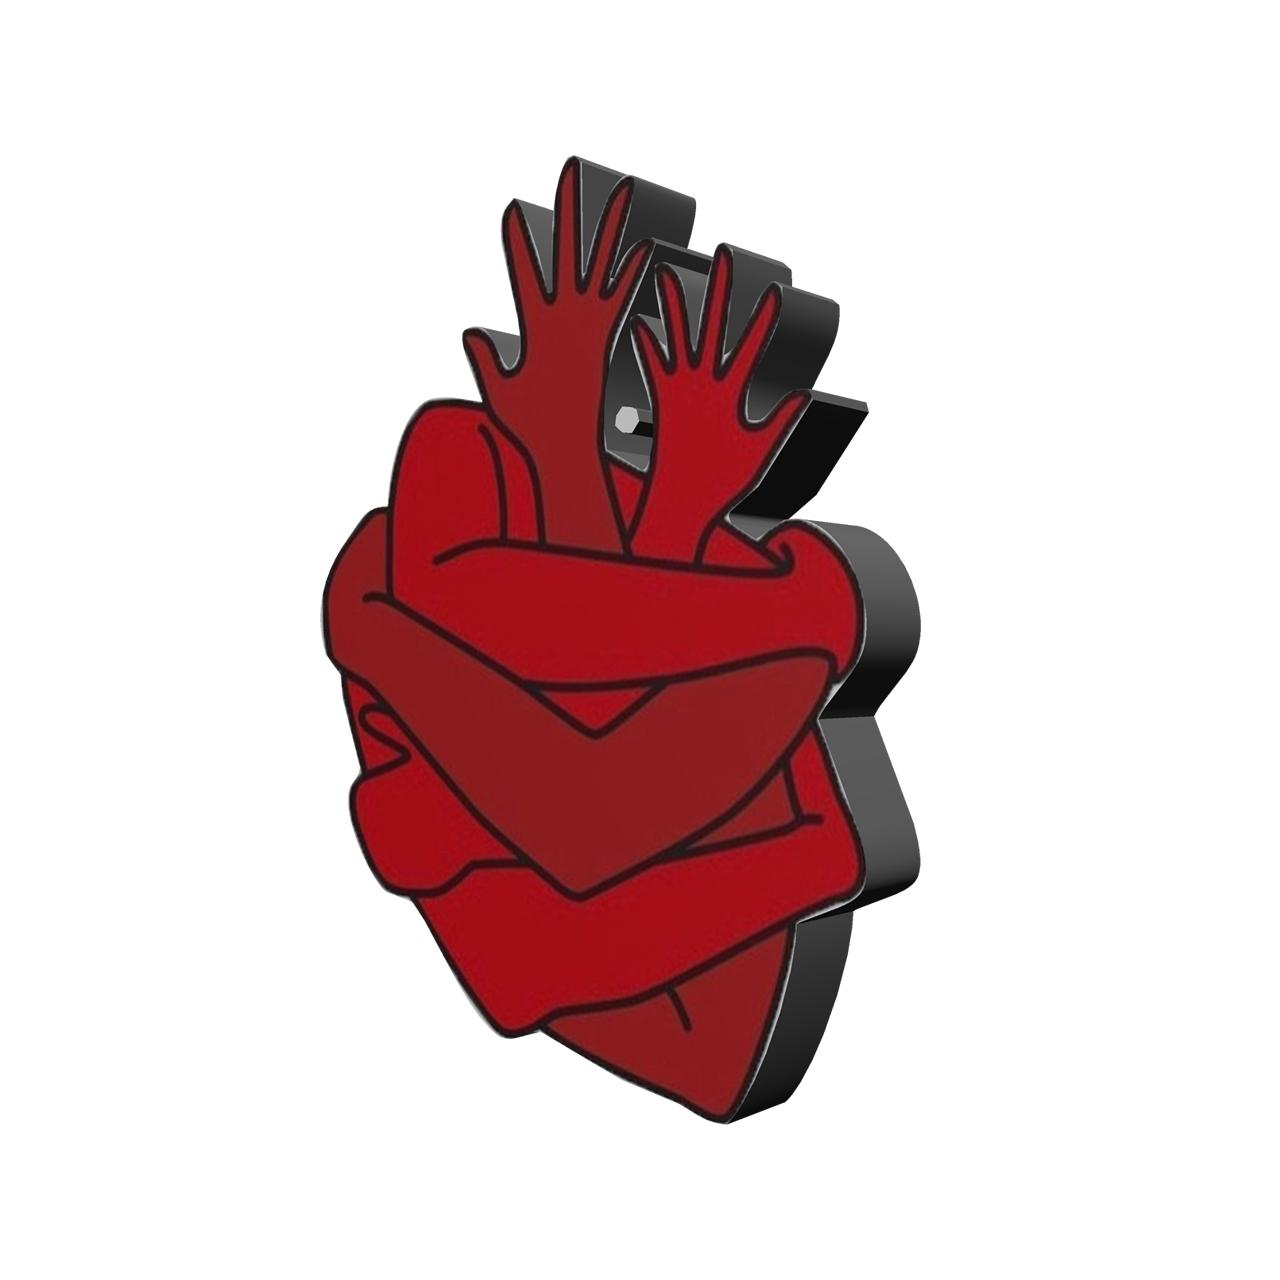 استیکر طرح قلب کد 228